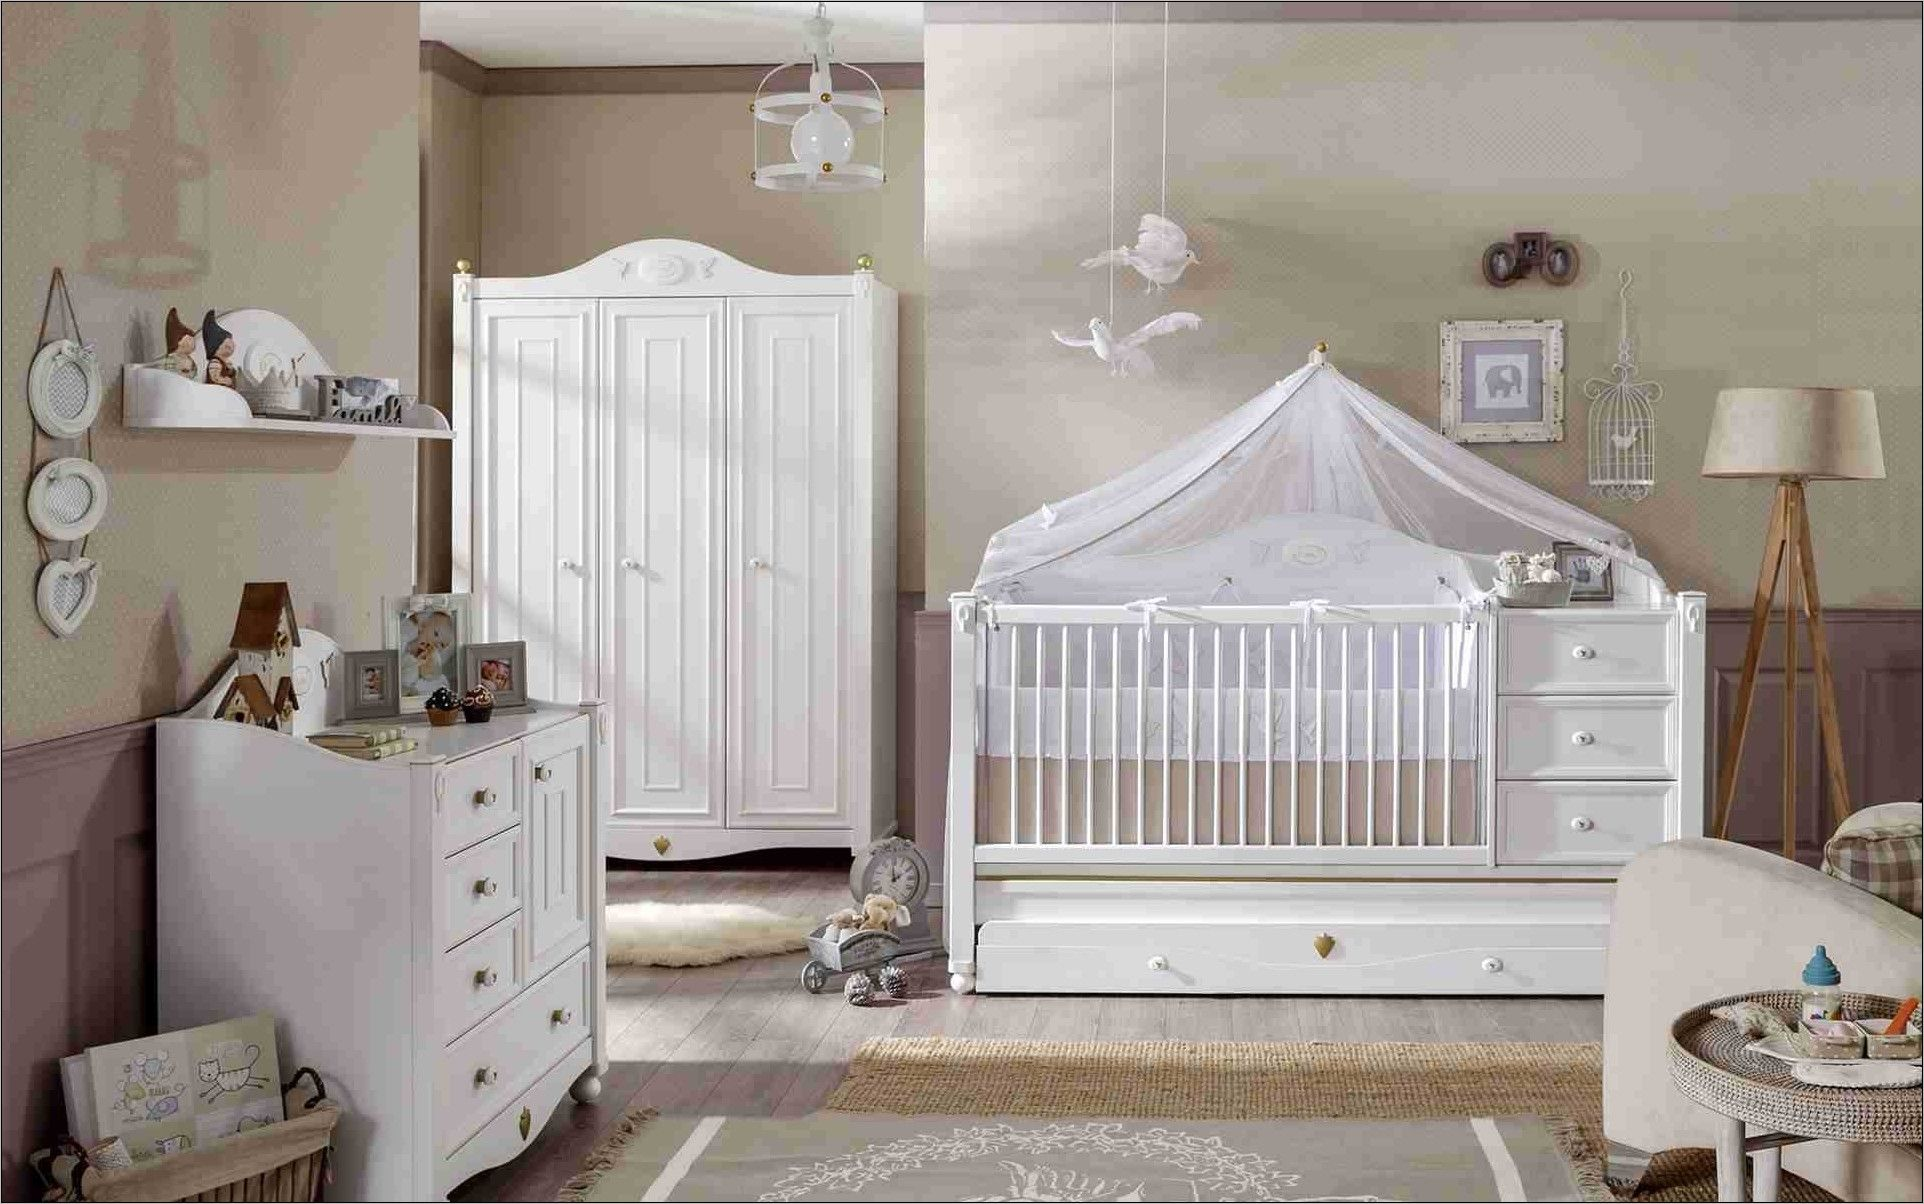 Image Deco Chambre Bebe Fille En 2020 Decoration Chambre Bebe